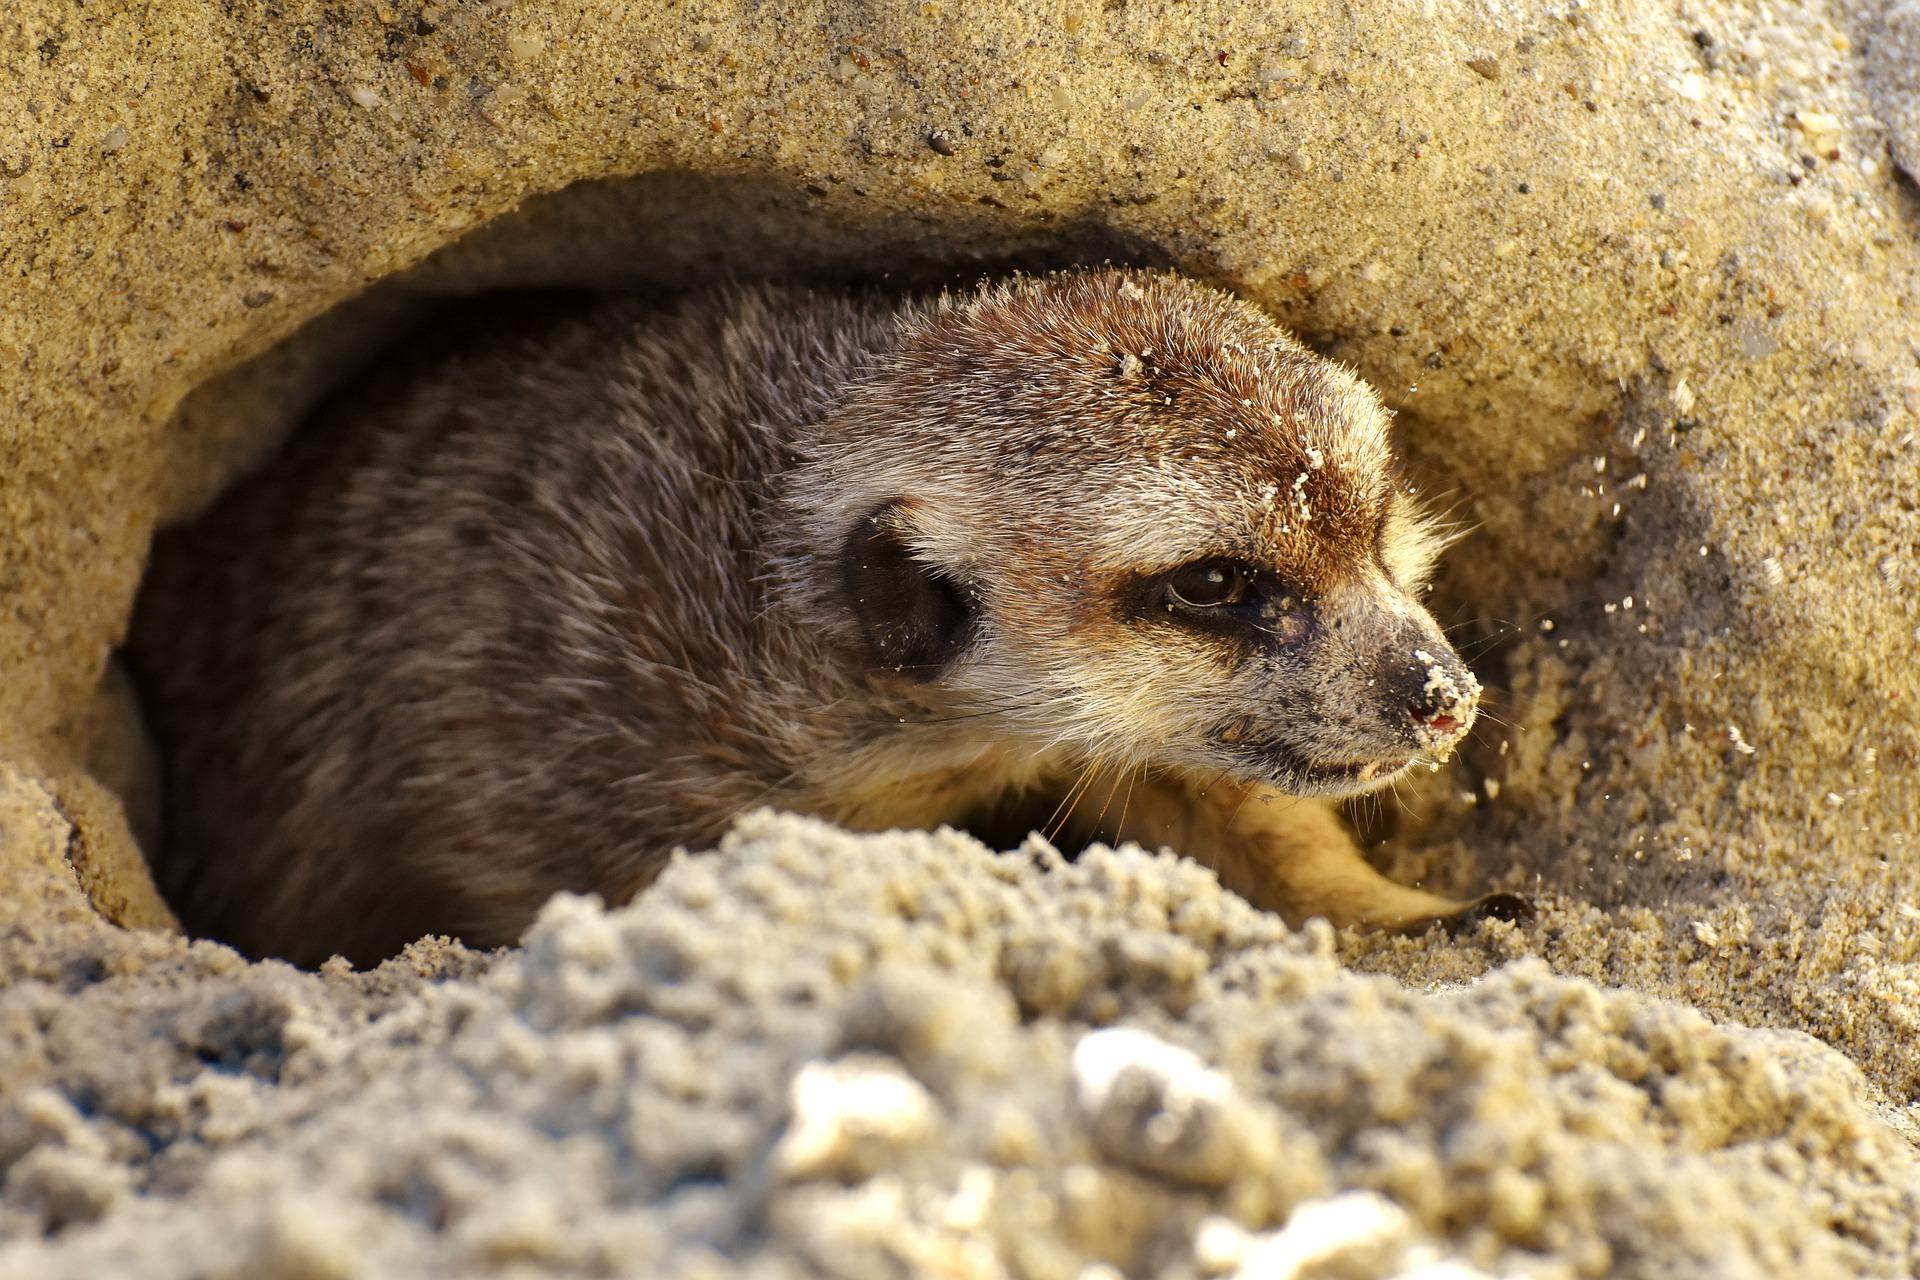 Where do meerkats sleep?